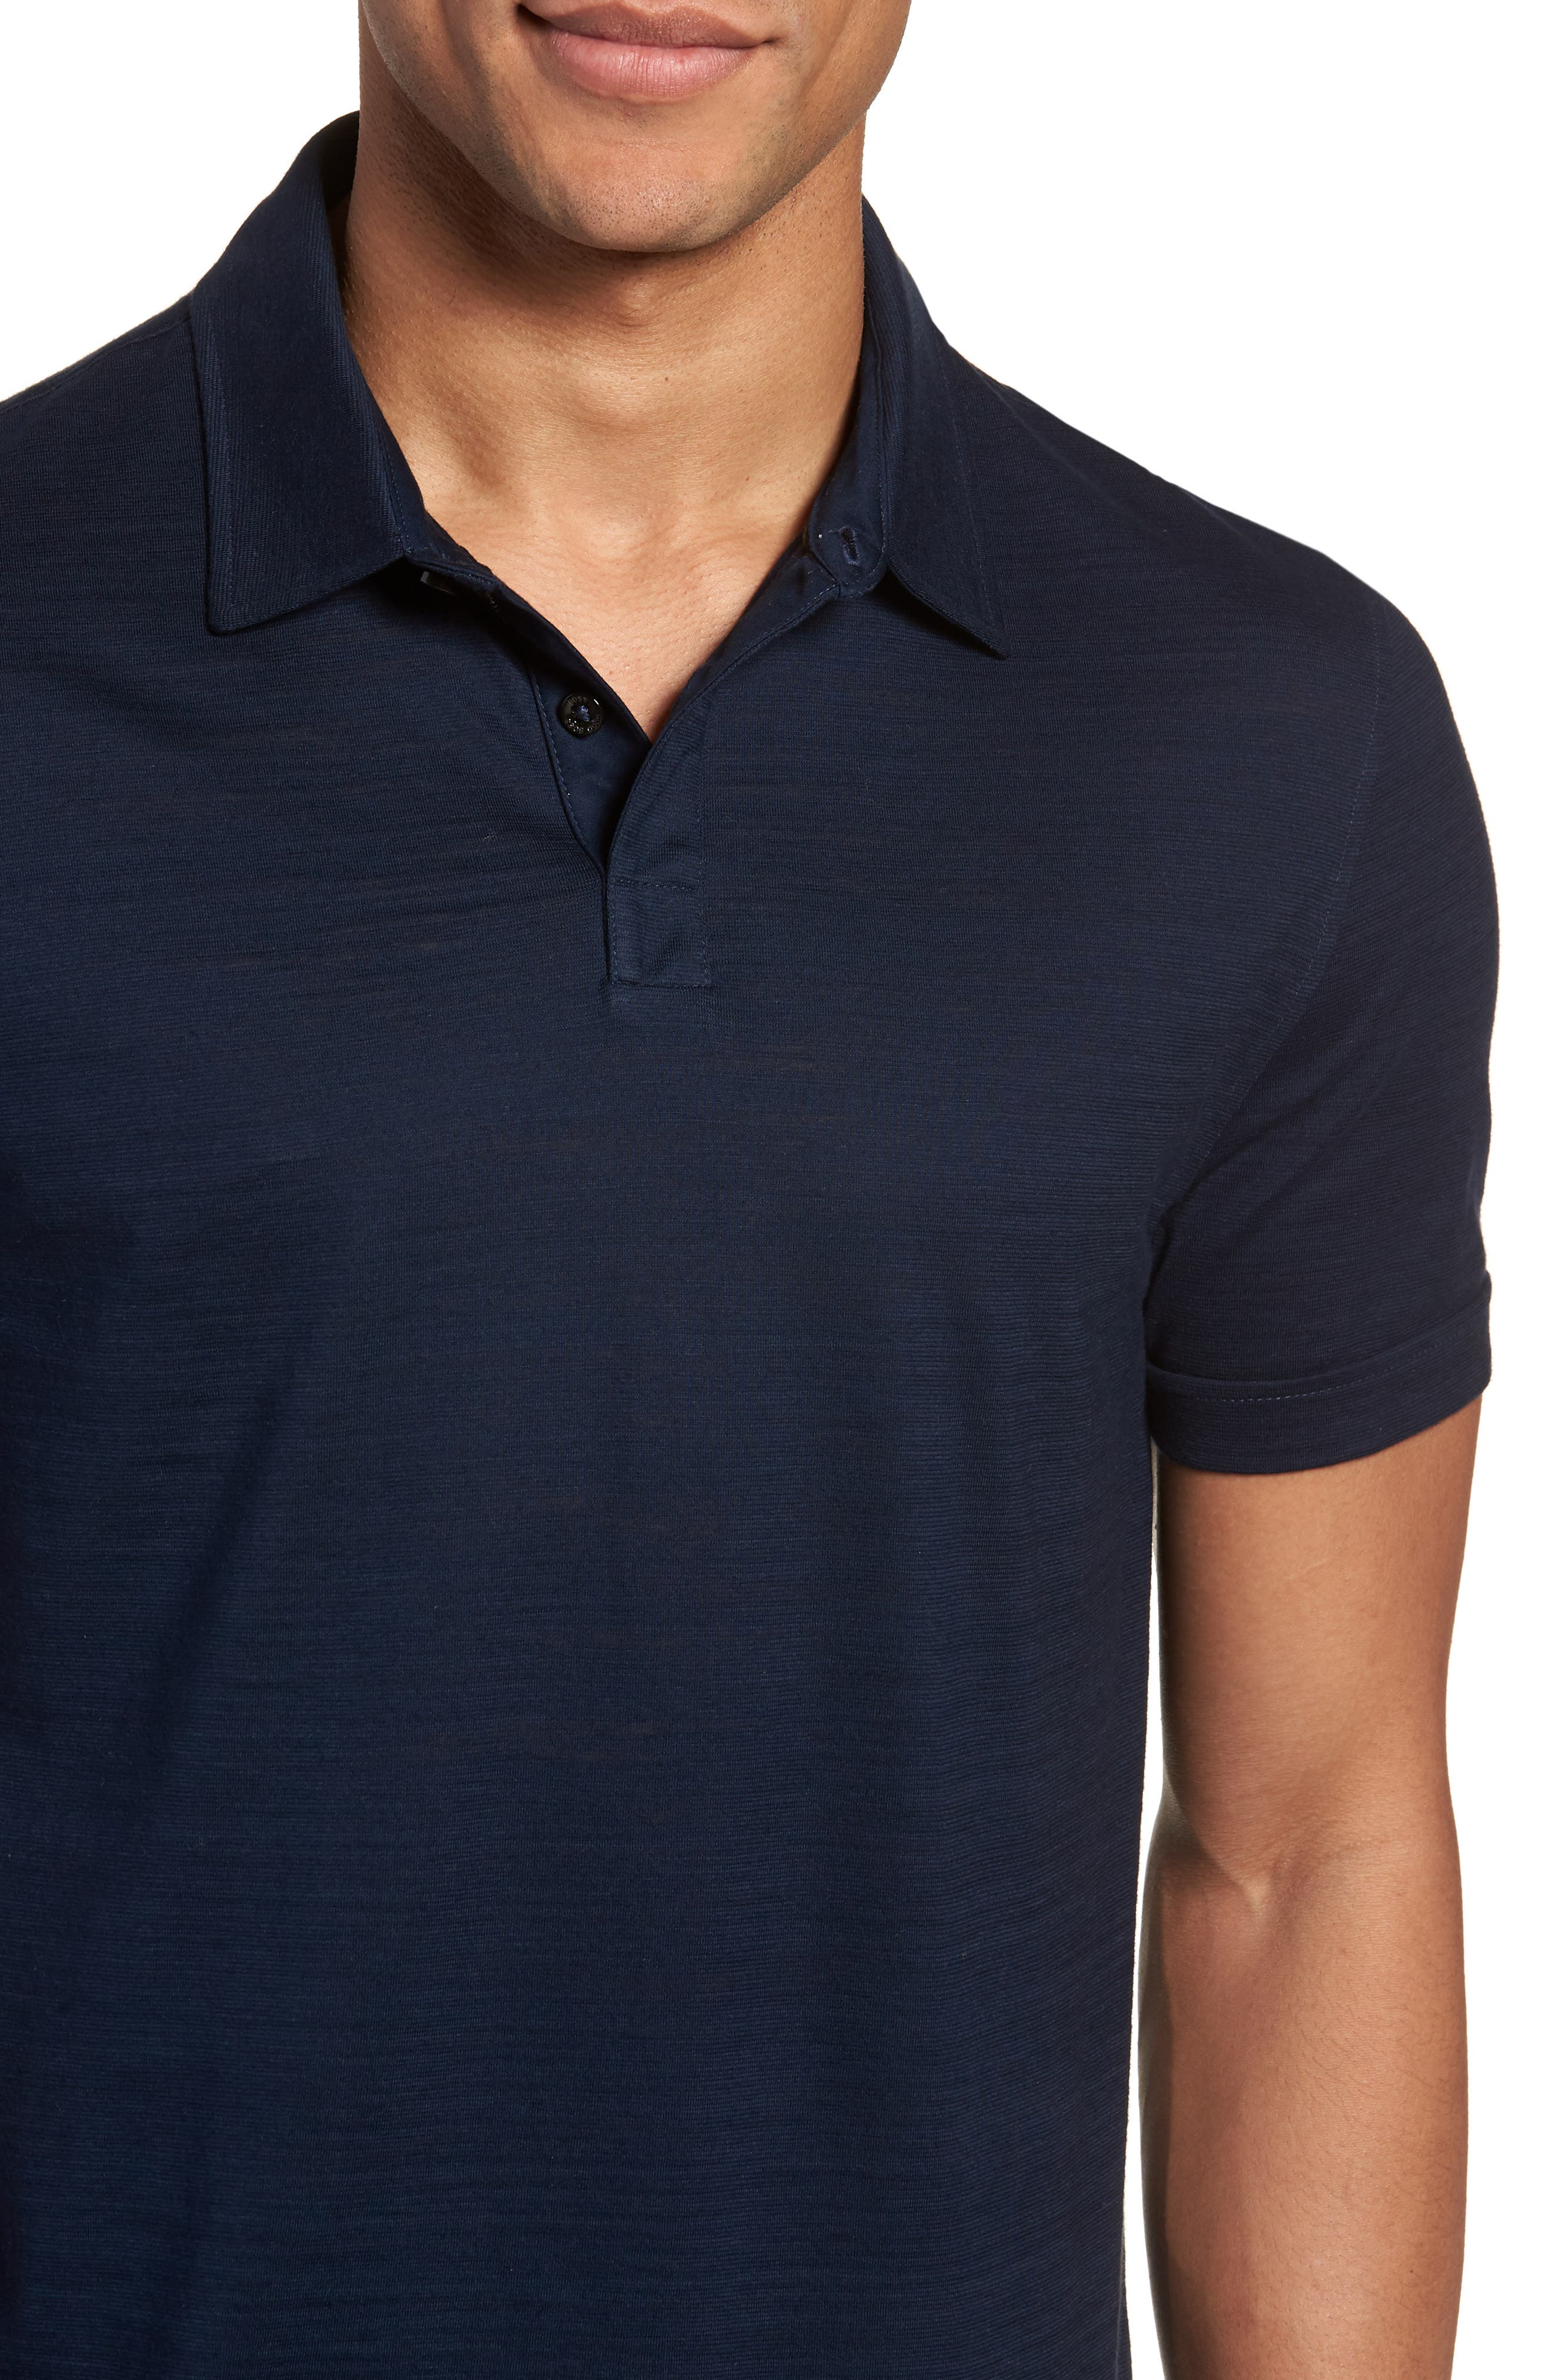 Press Flame Slim Fit Polo Shirt,                             Alternate thumbnail 4, color,                             Blue